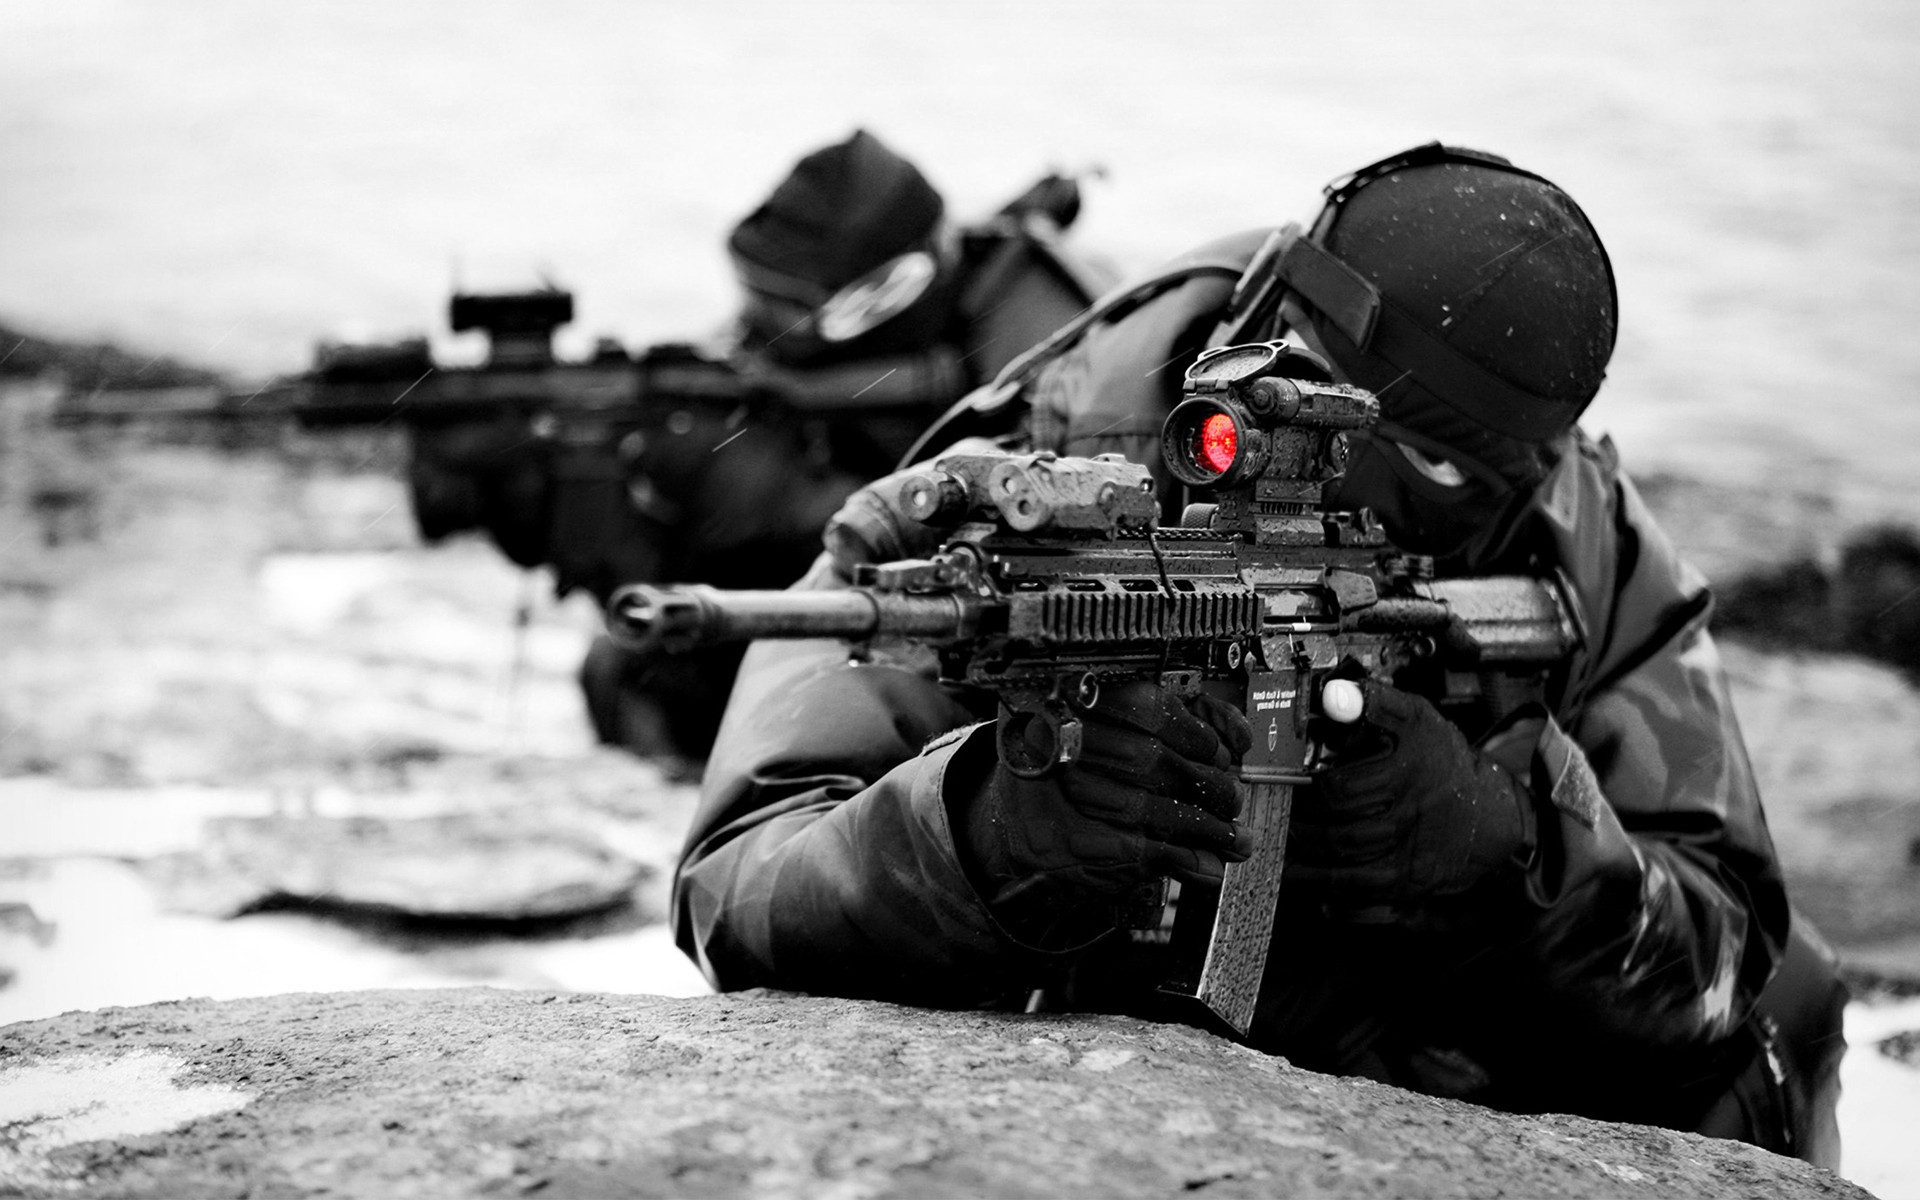 Sniper 889181 Sniper 889148 Sniper 889129 Sniper Wallpaper 889307 1920x1200